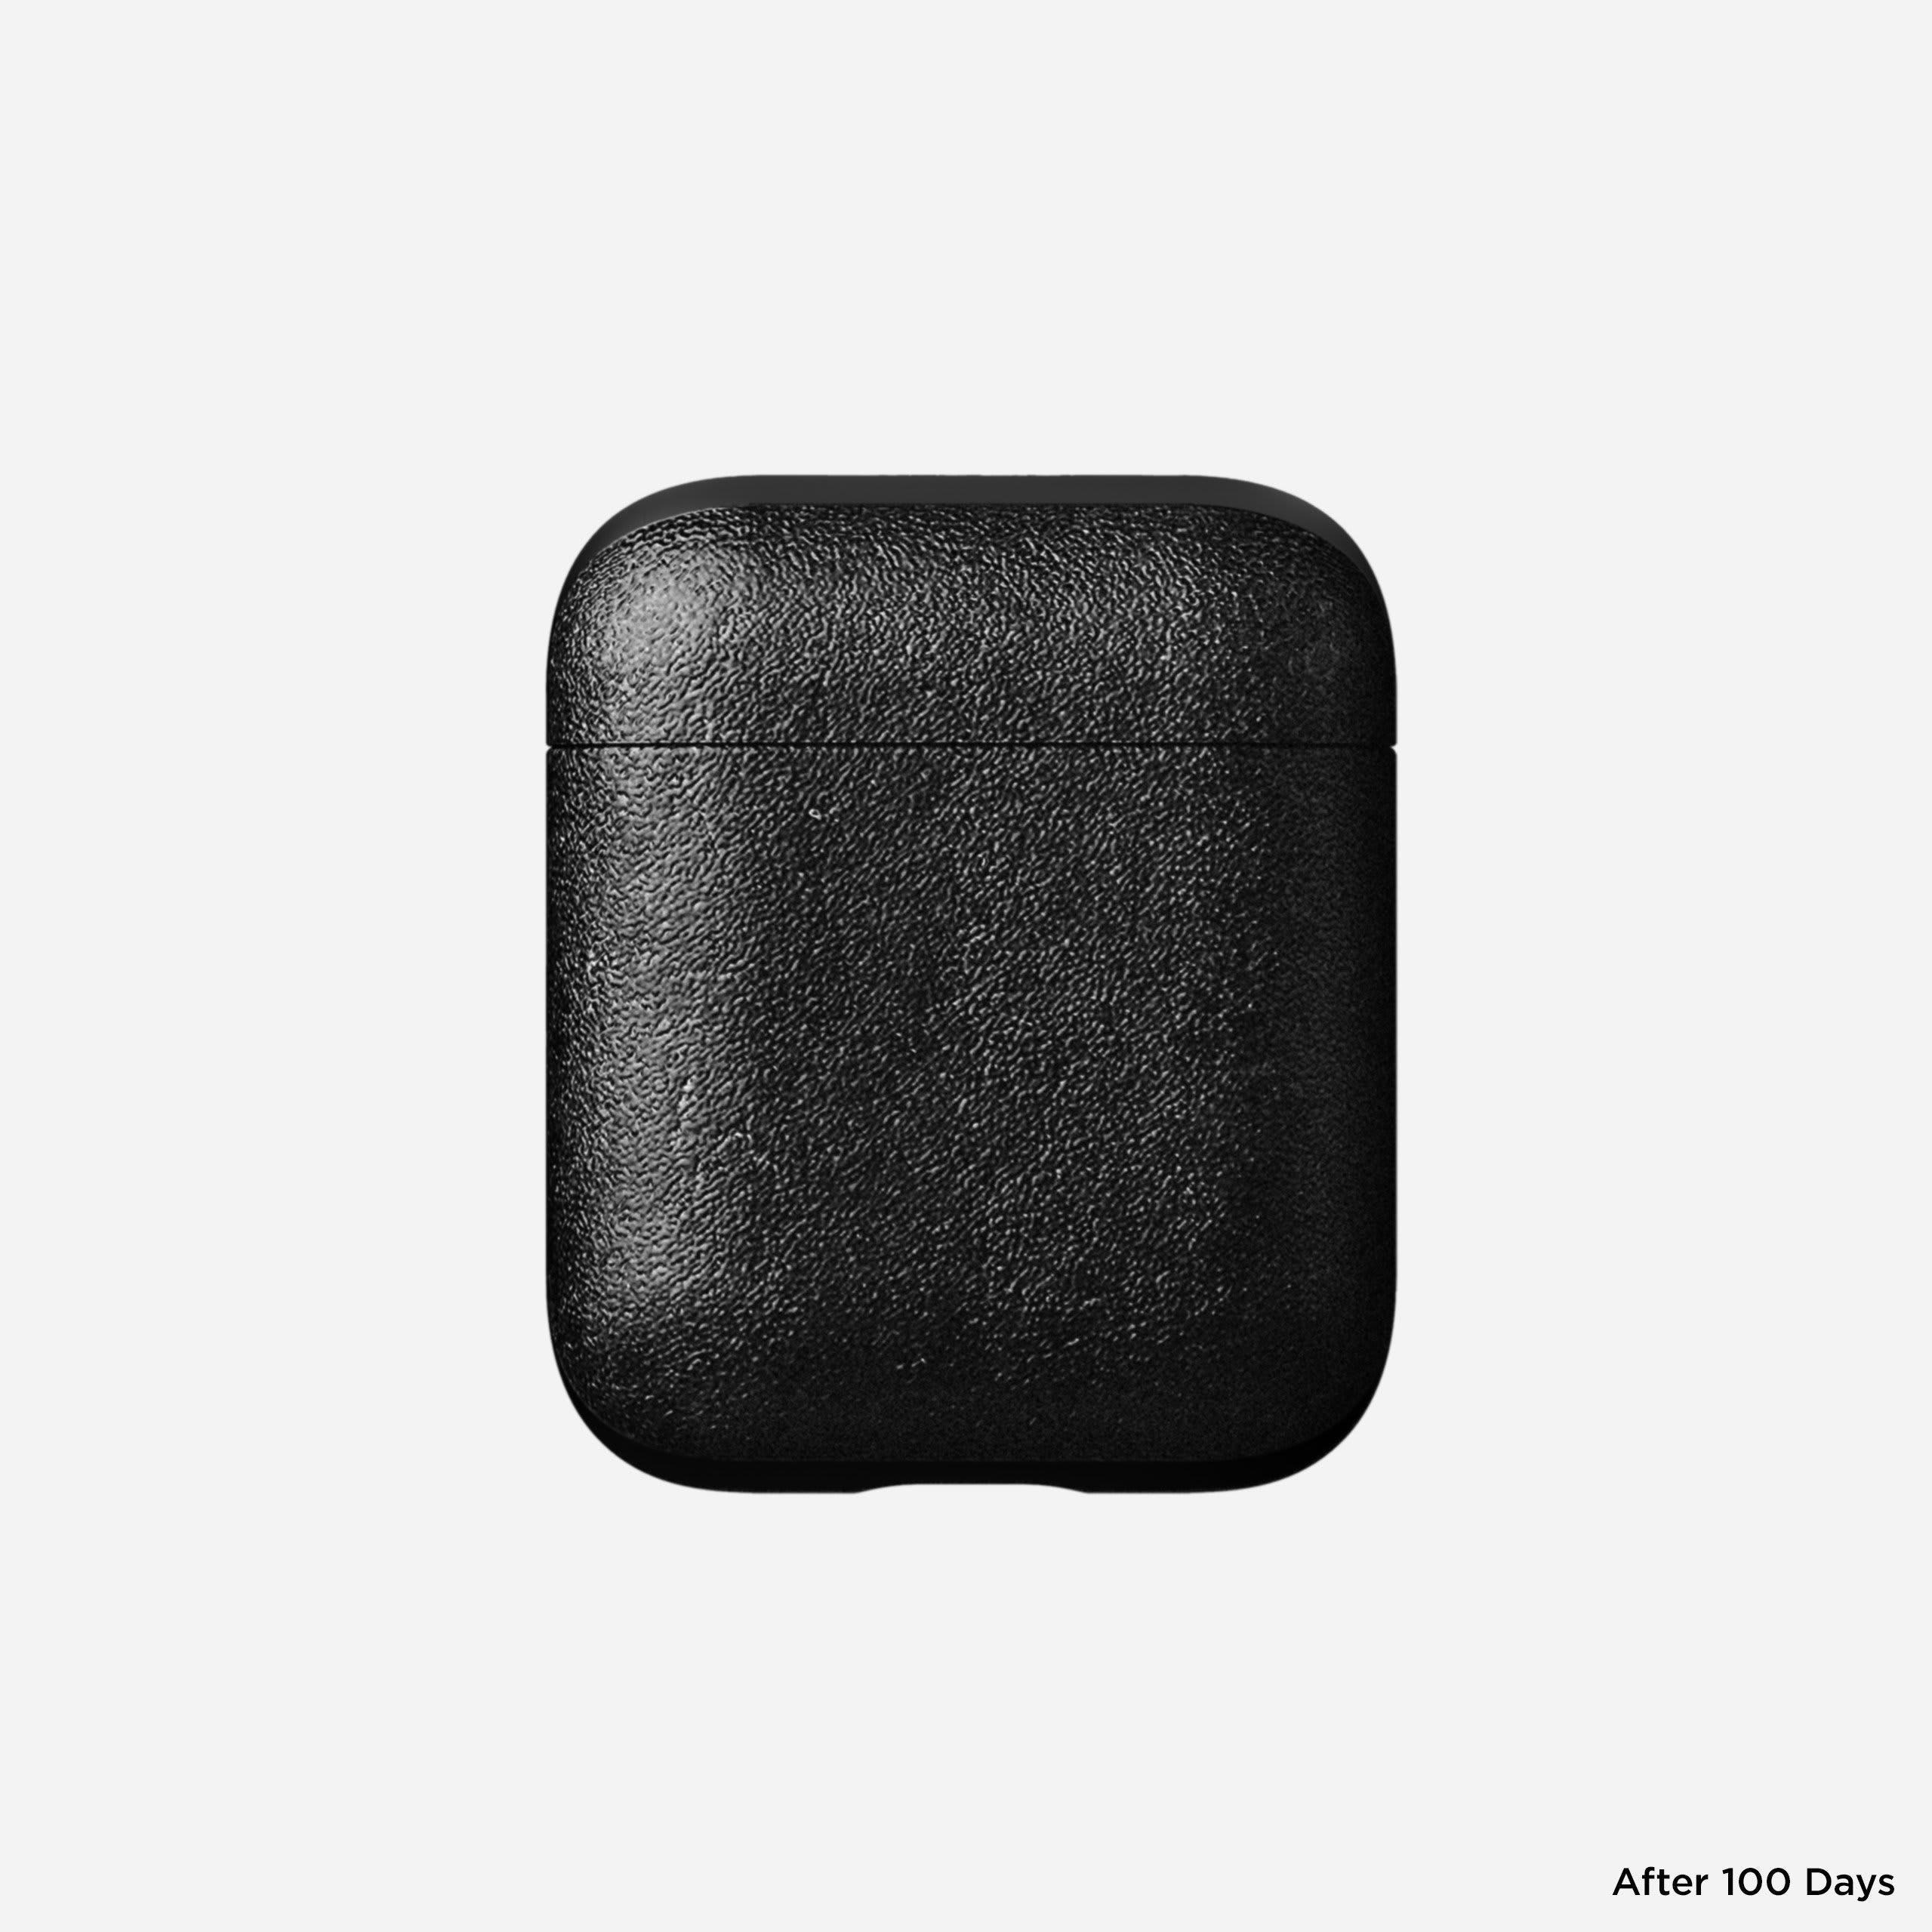 Rugged case airpods black